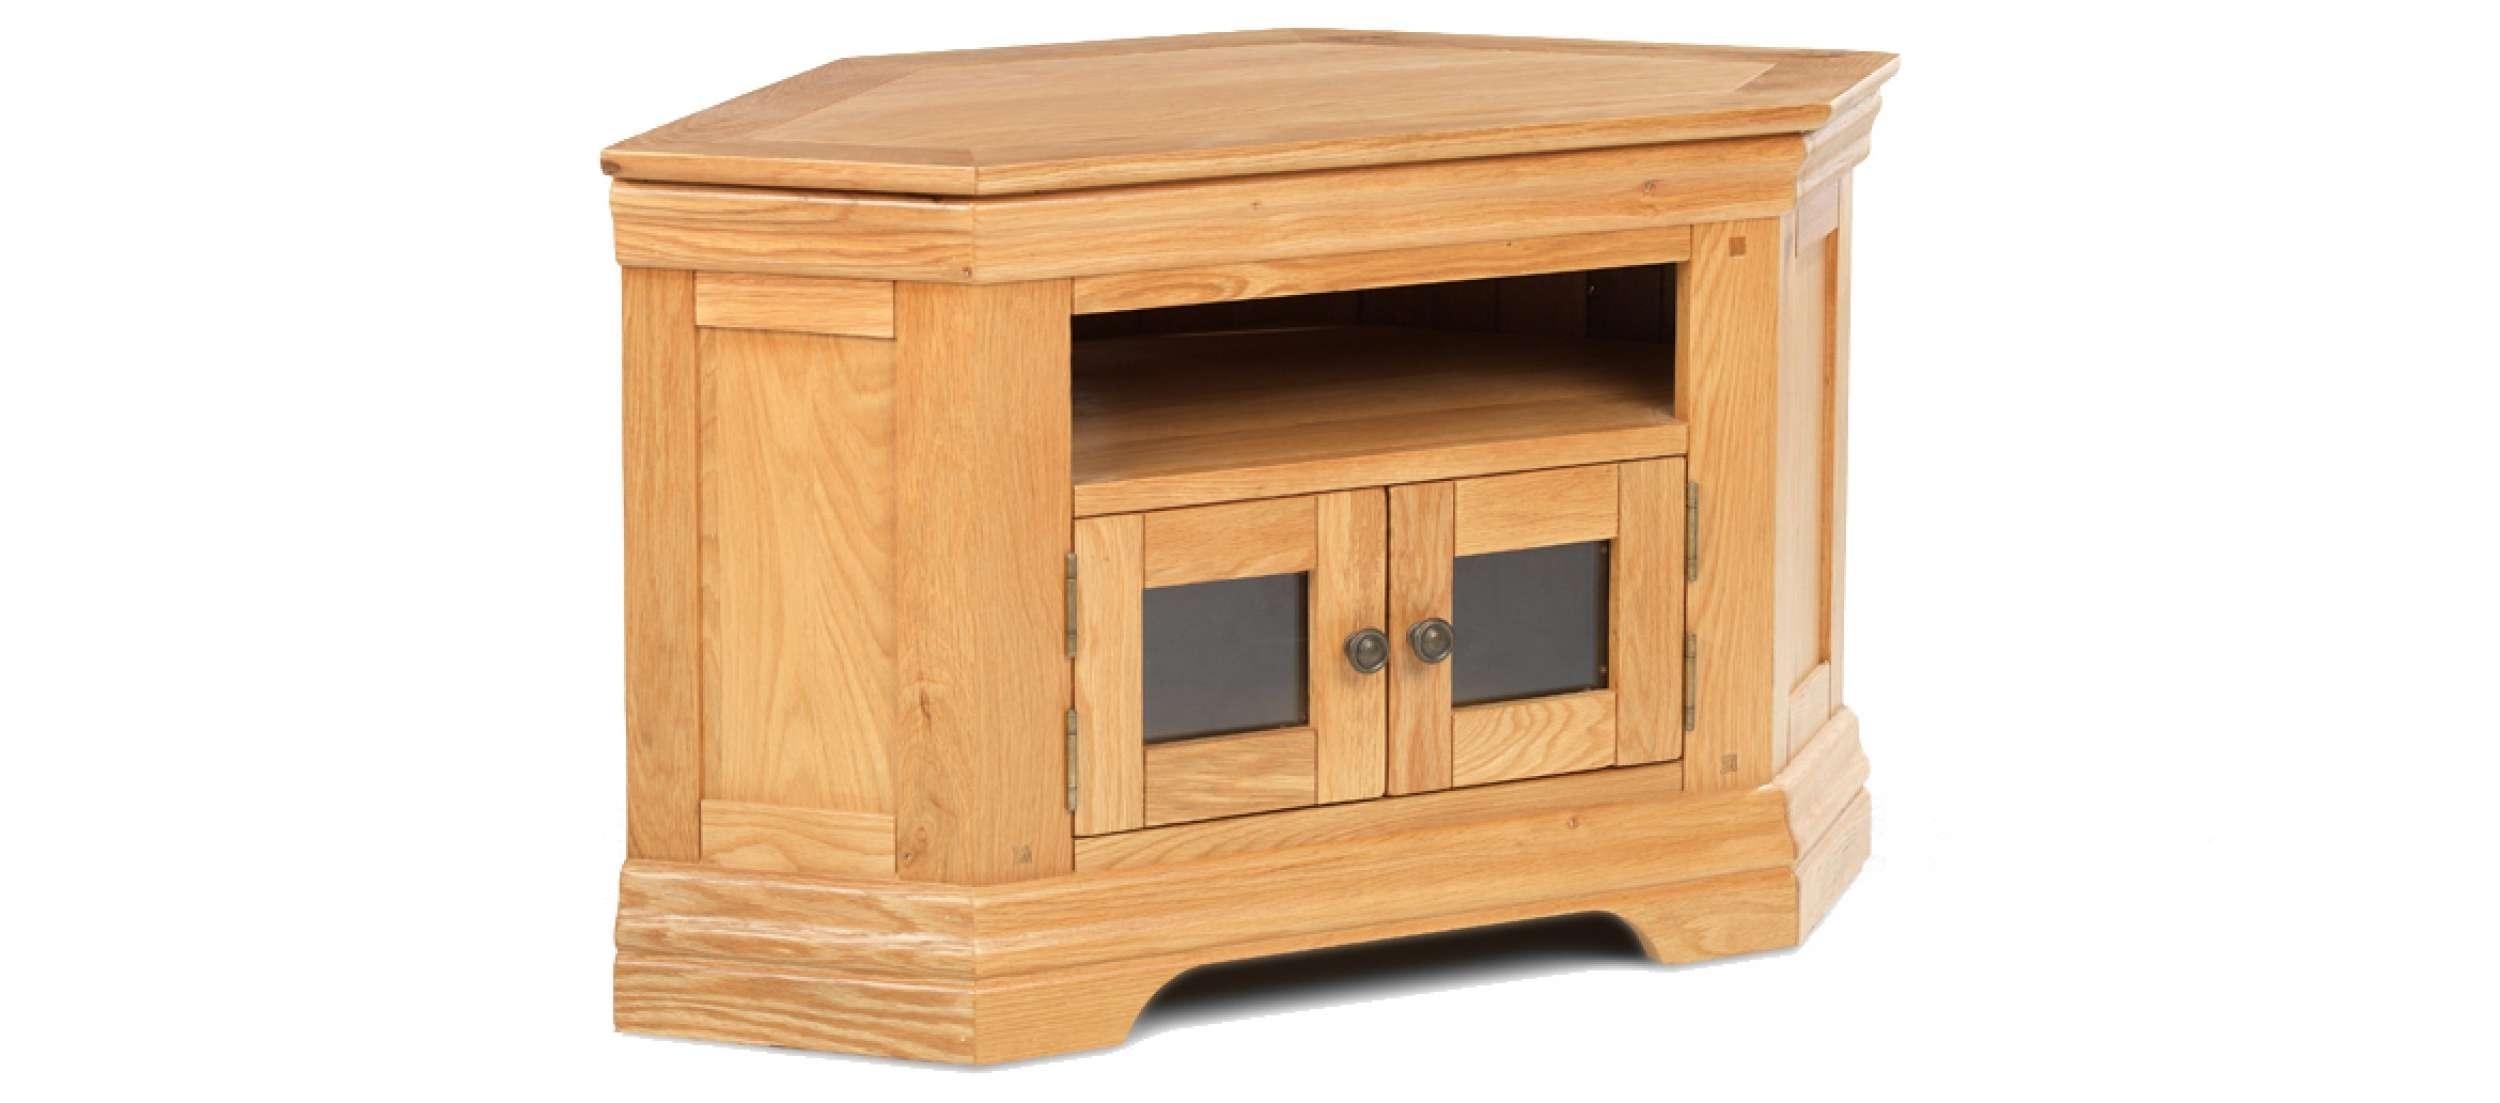 Constance Oak Corner Tv Cabinet | Quercus Living With Regard To Corner Oak Tv Stands (View 2 of 15)